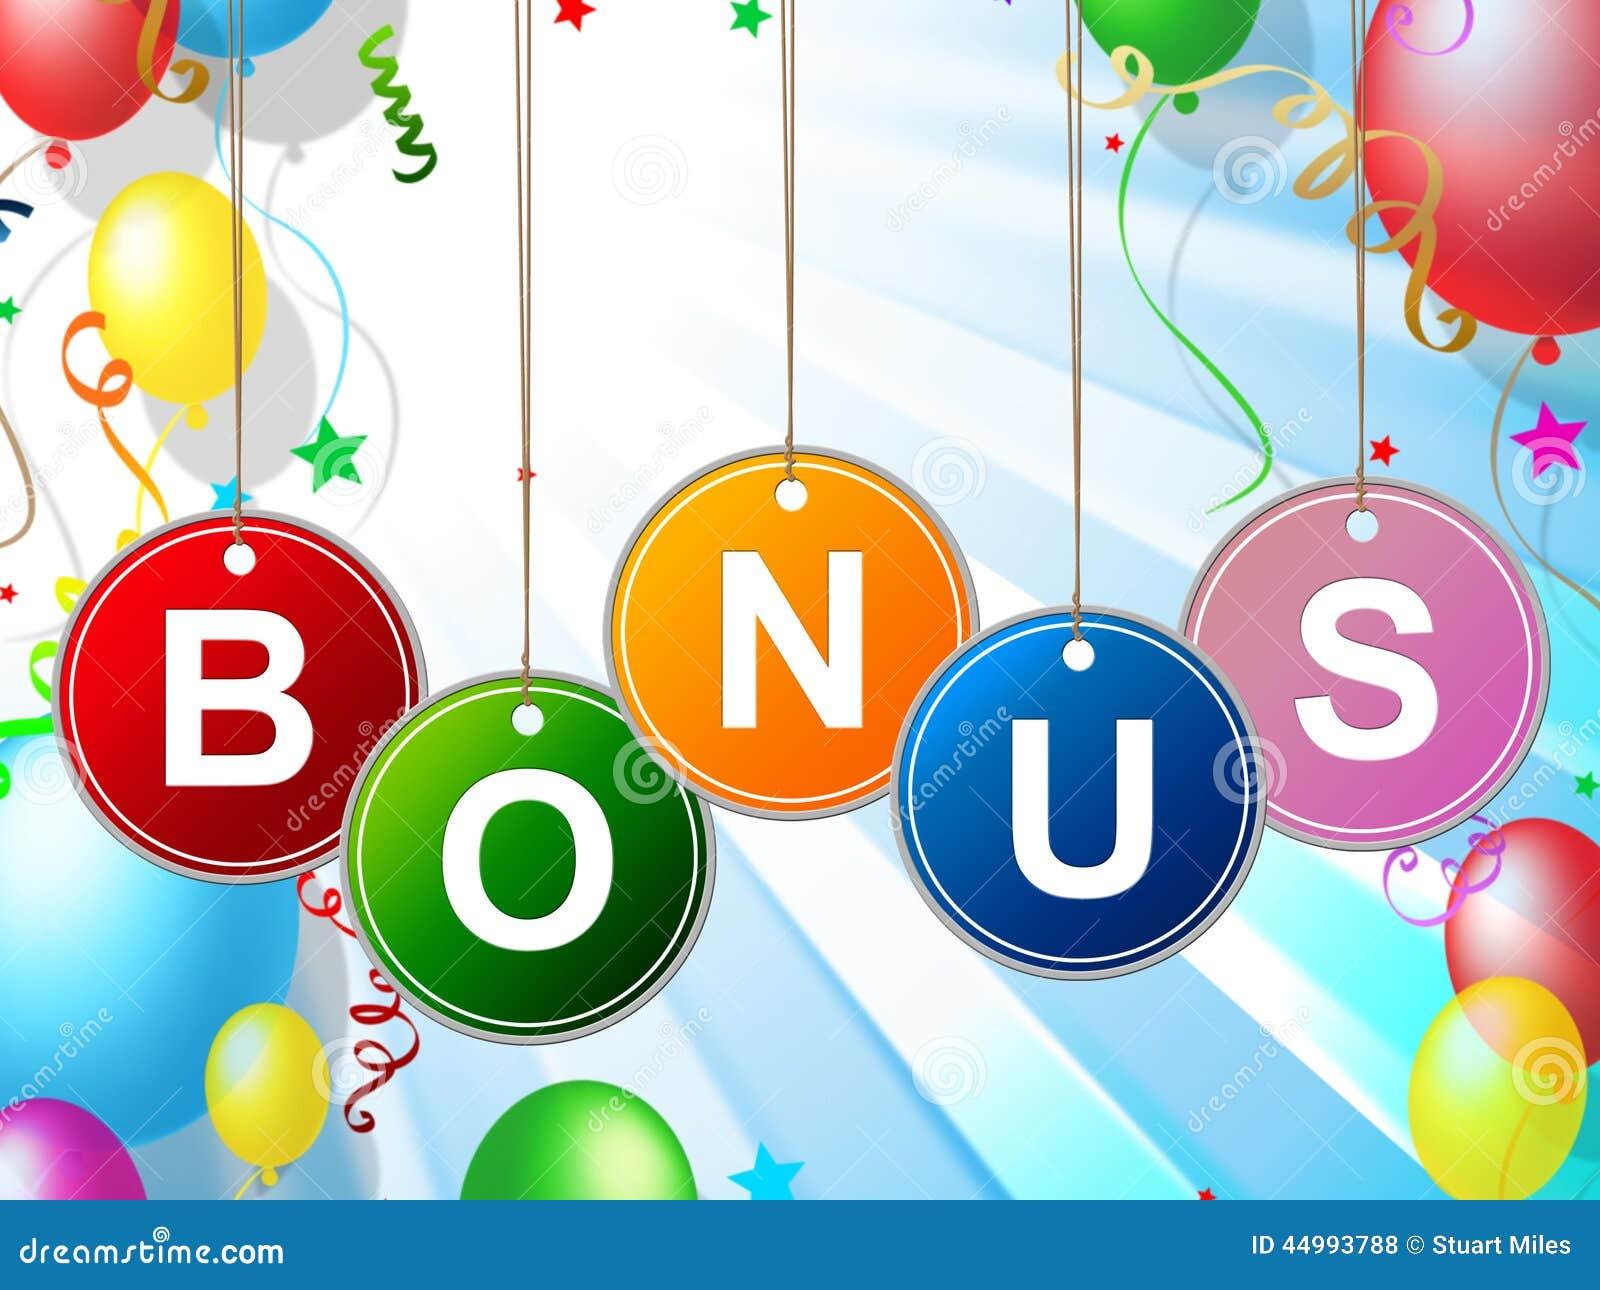 Bonus | Definition of Bonus by Merriam-Webster